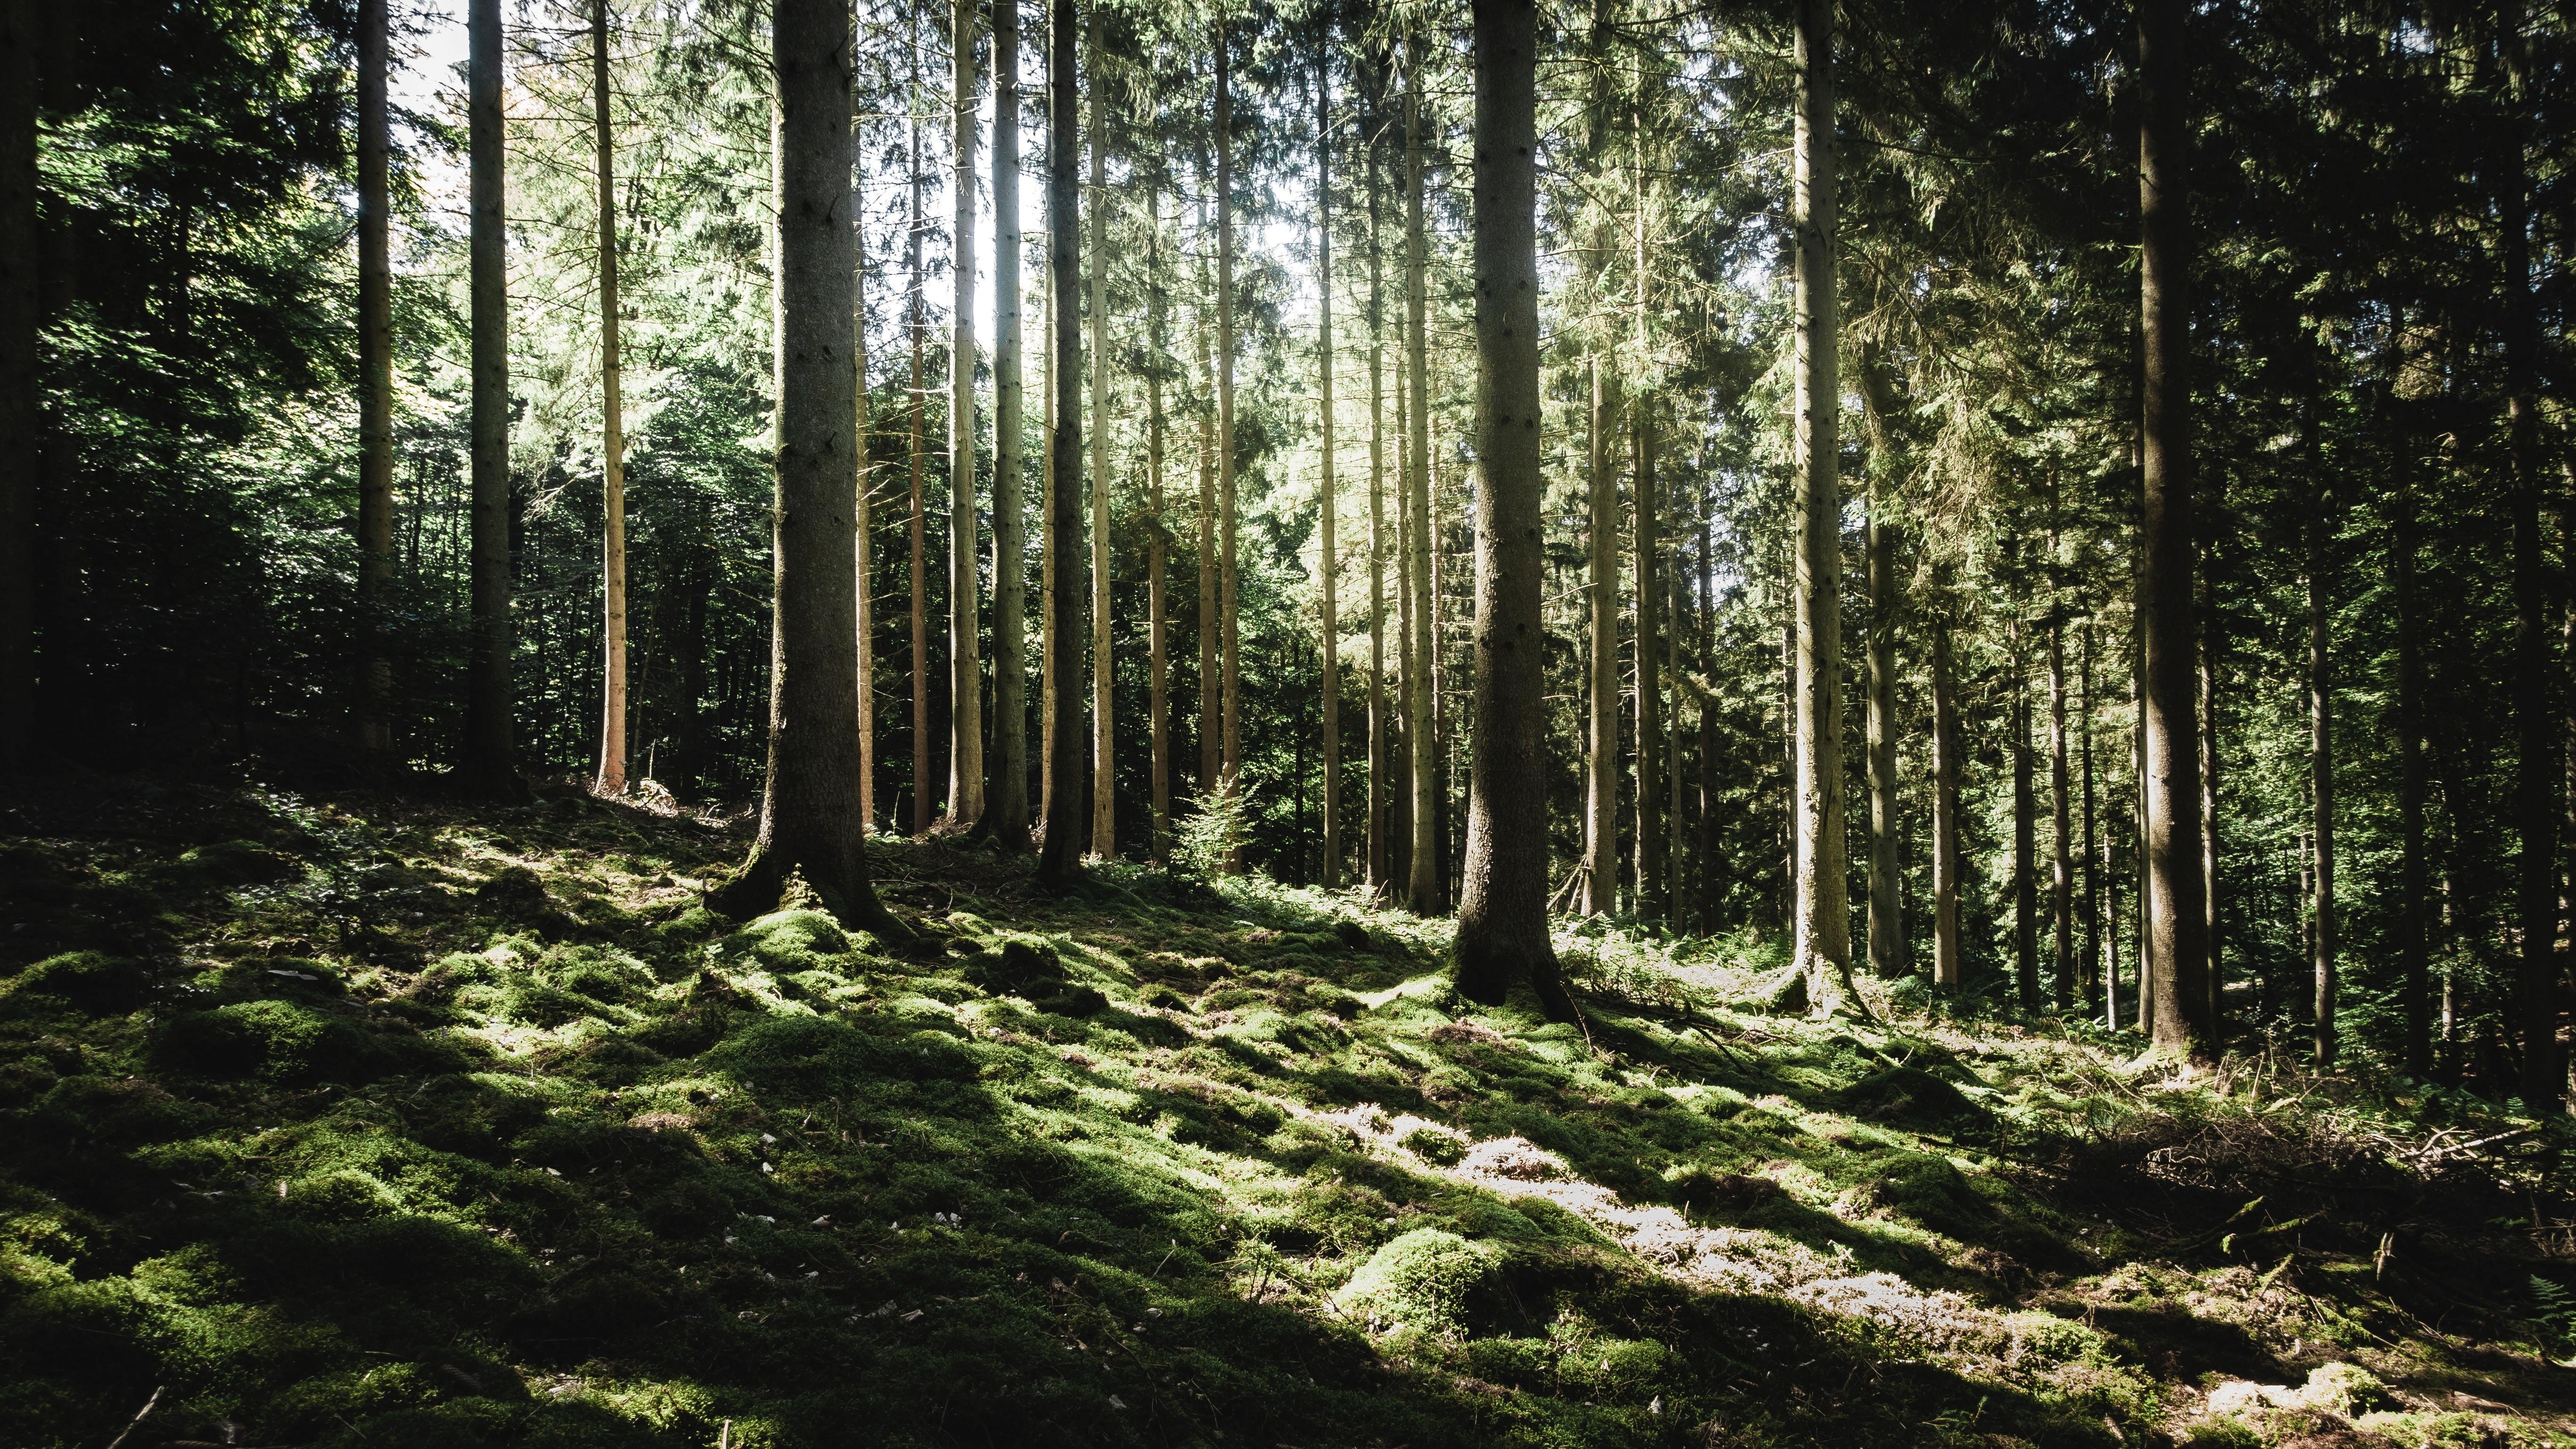 Forest in Libin, Belgium. Image: Frédéric Perez on Unsplash